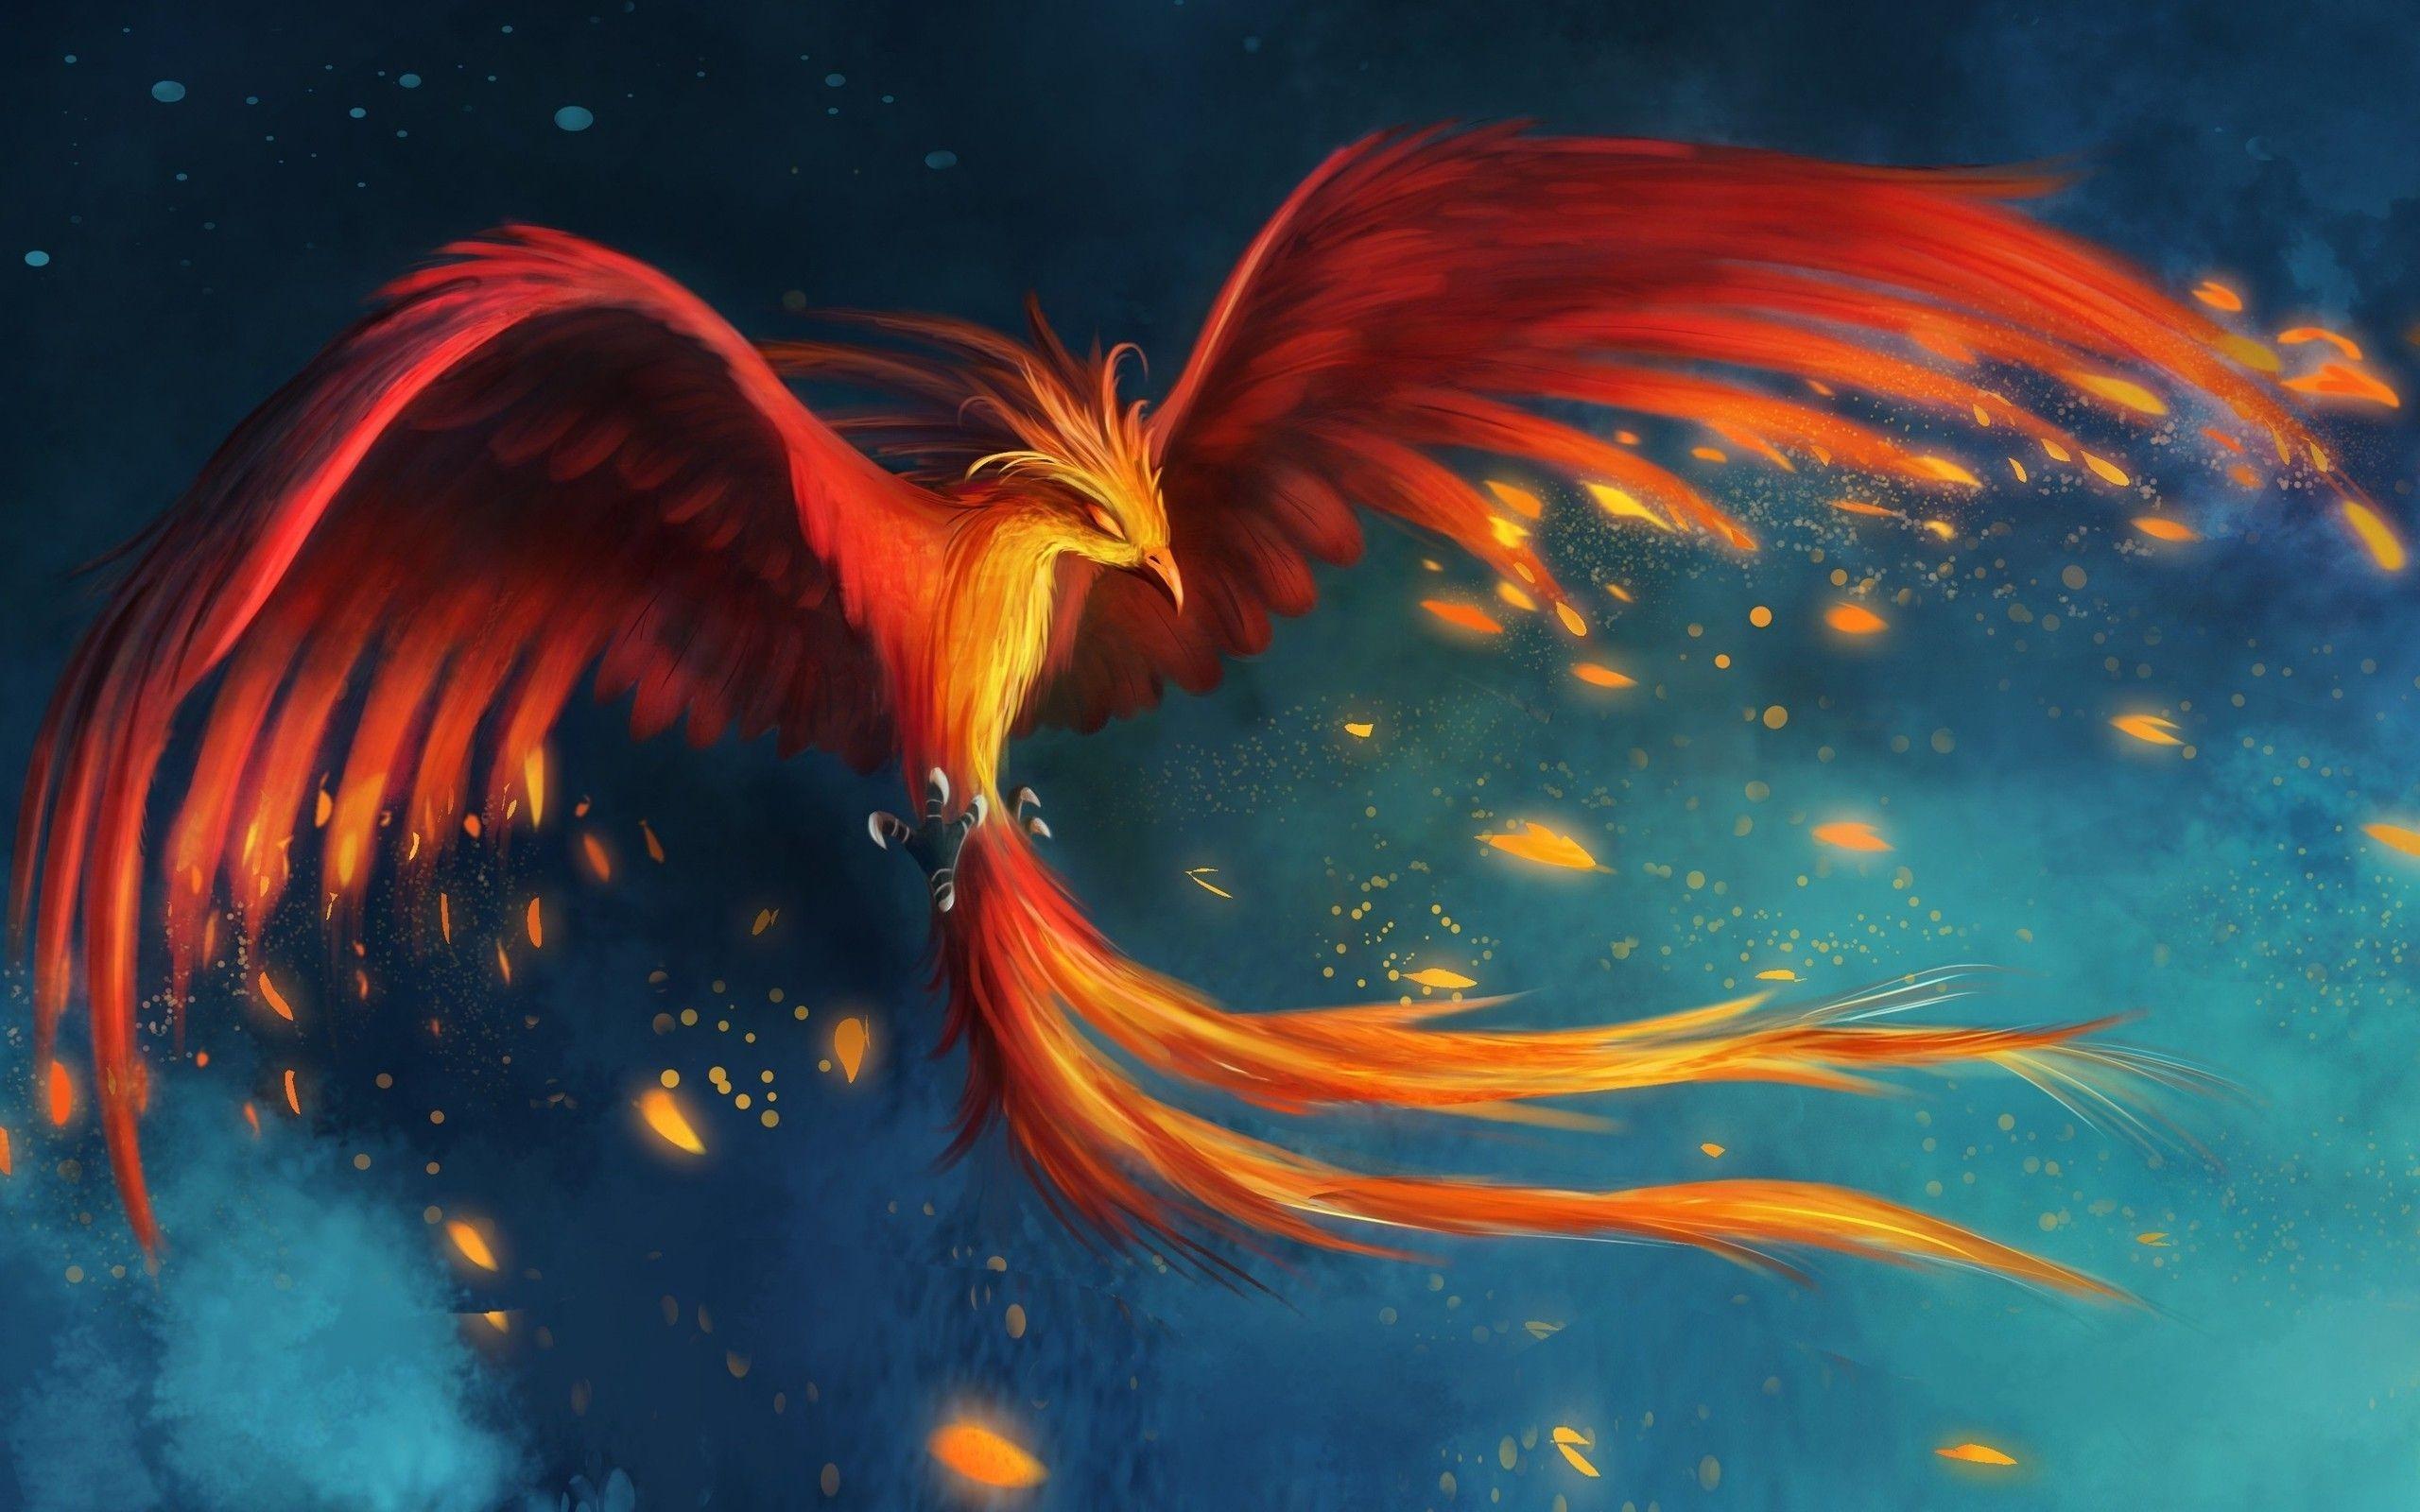 phoenix wallpaper hd (80+ images)